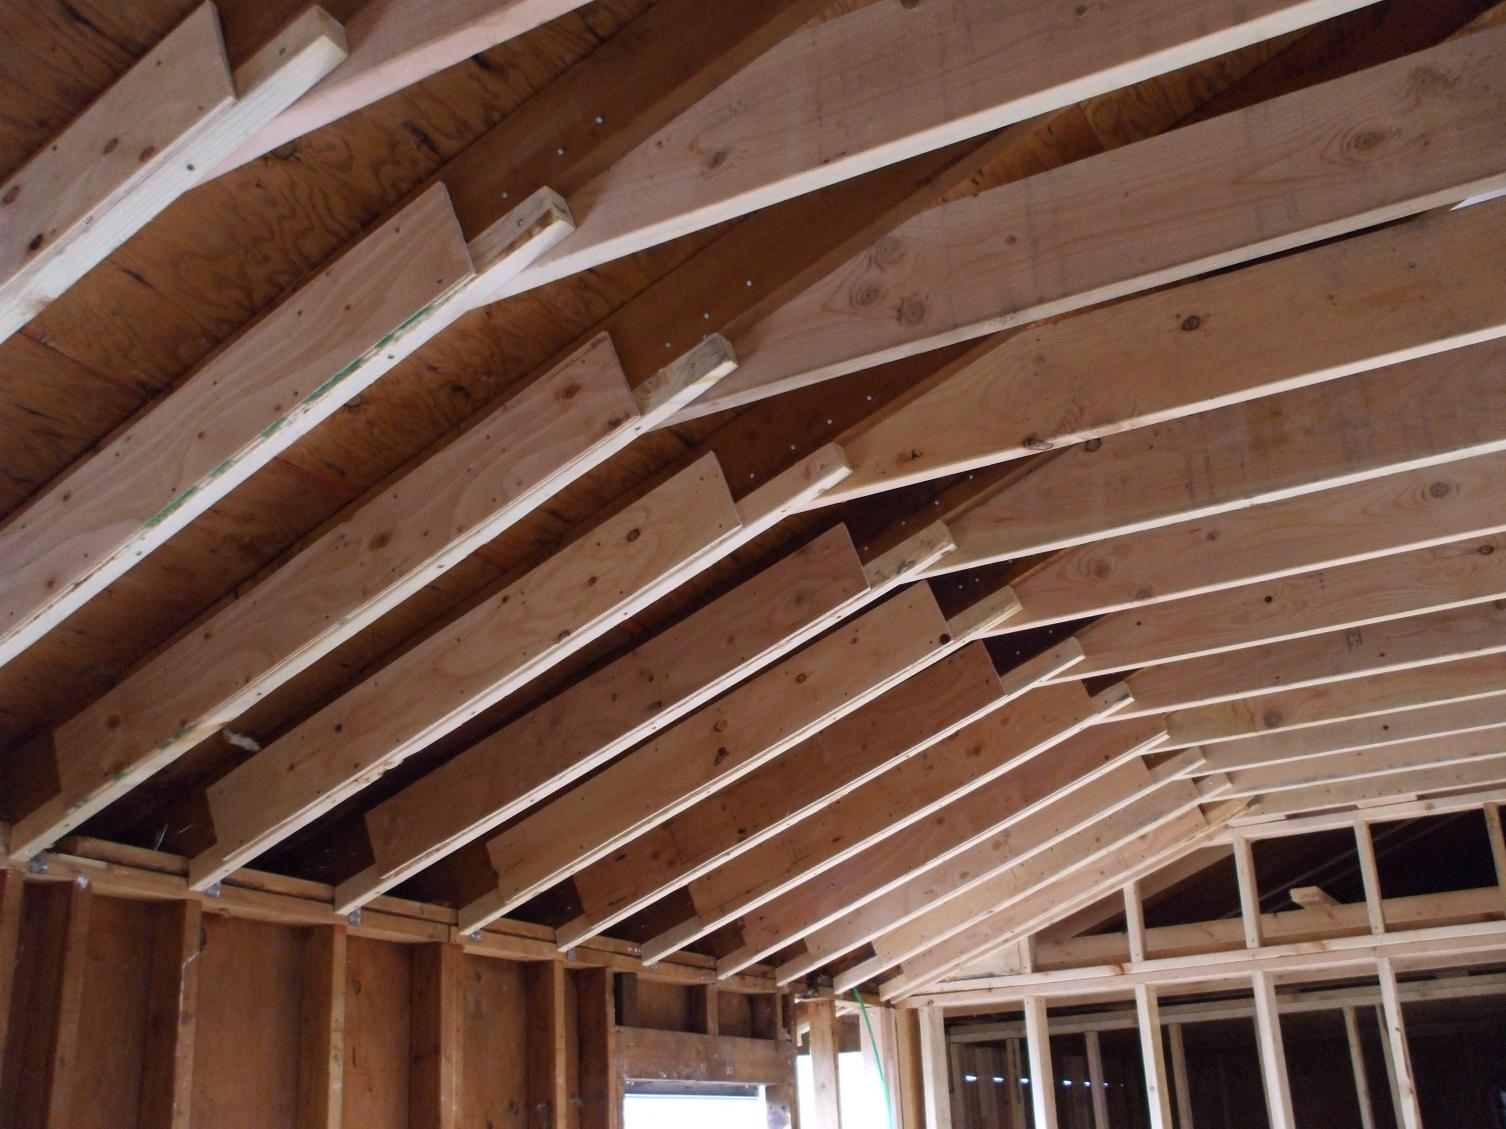 Garage - Rafters Upgrade-dscf1697.jpg